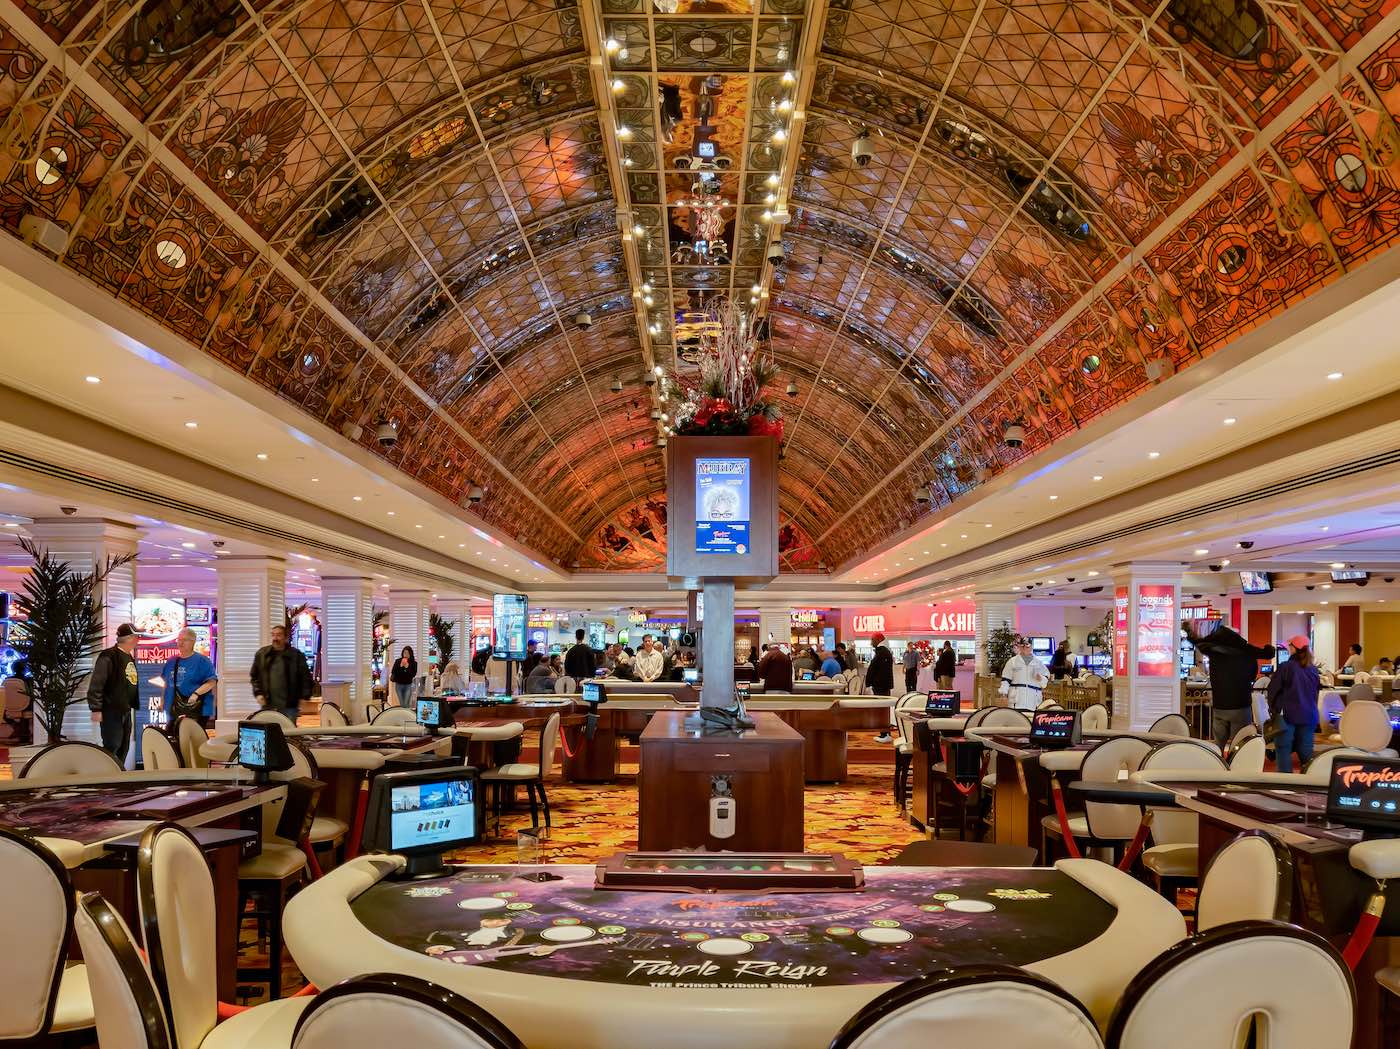 Casino in the Tropicana Las Vegas